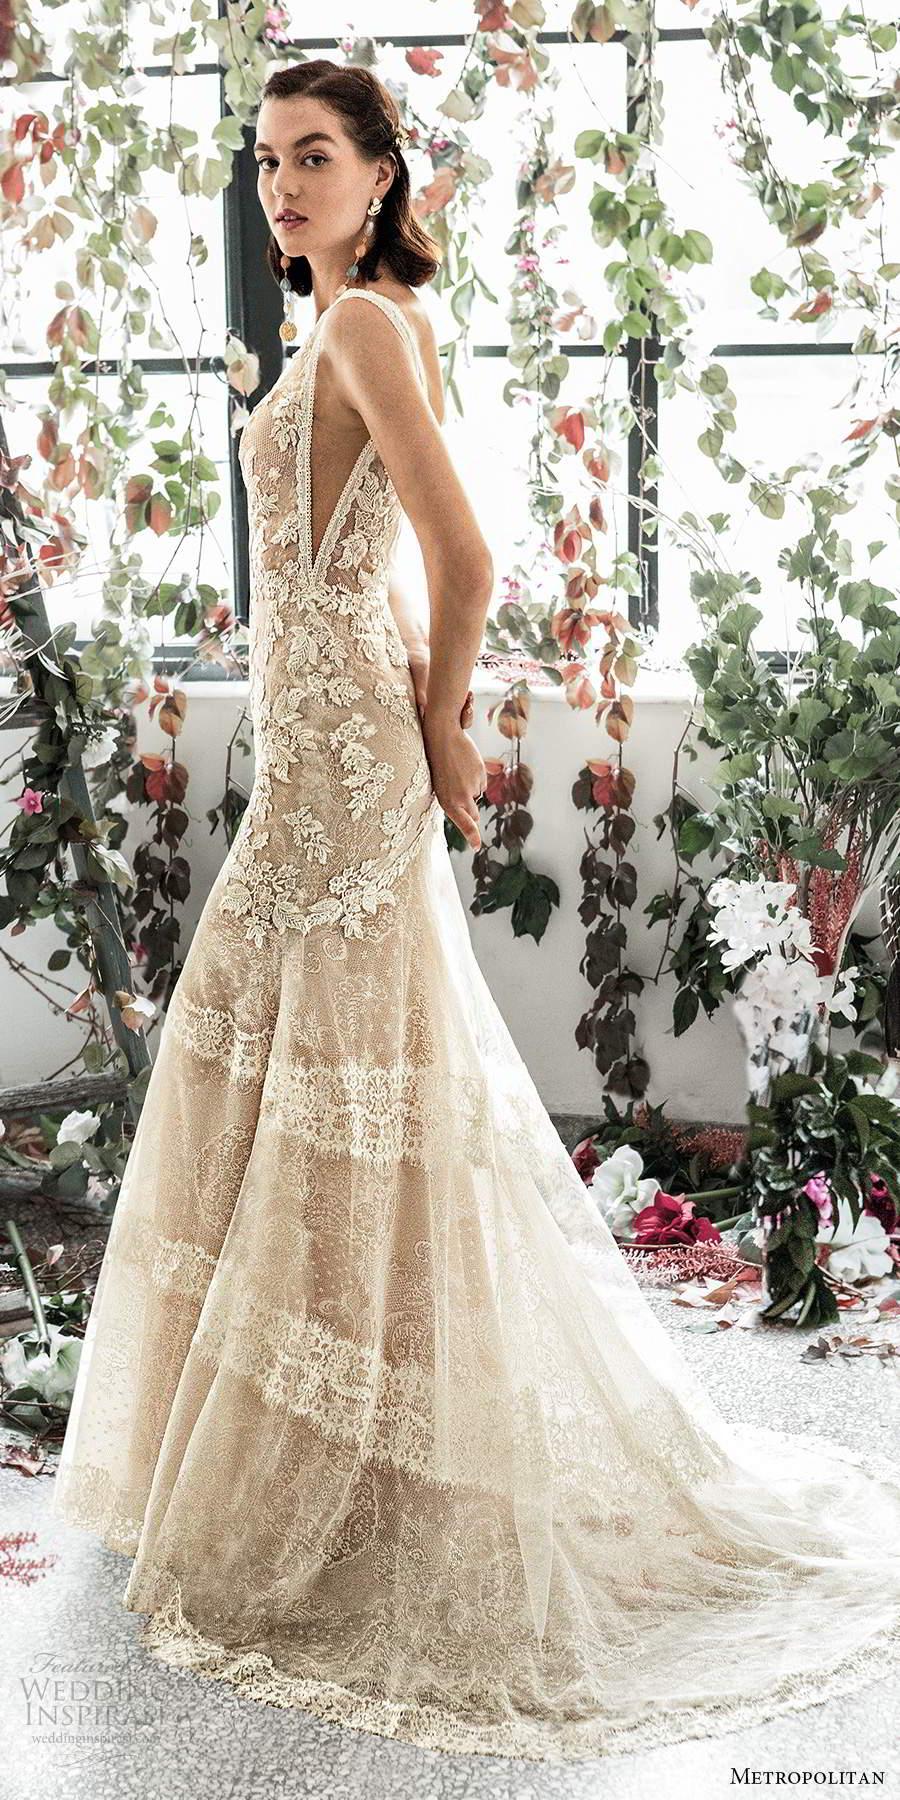 metropolitan spring 2020 bridal sleeveless thick straps plunging v neckline fully embellished lace sheath fit flare trumpet wedding dress v back chapel train (9) sv